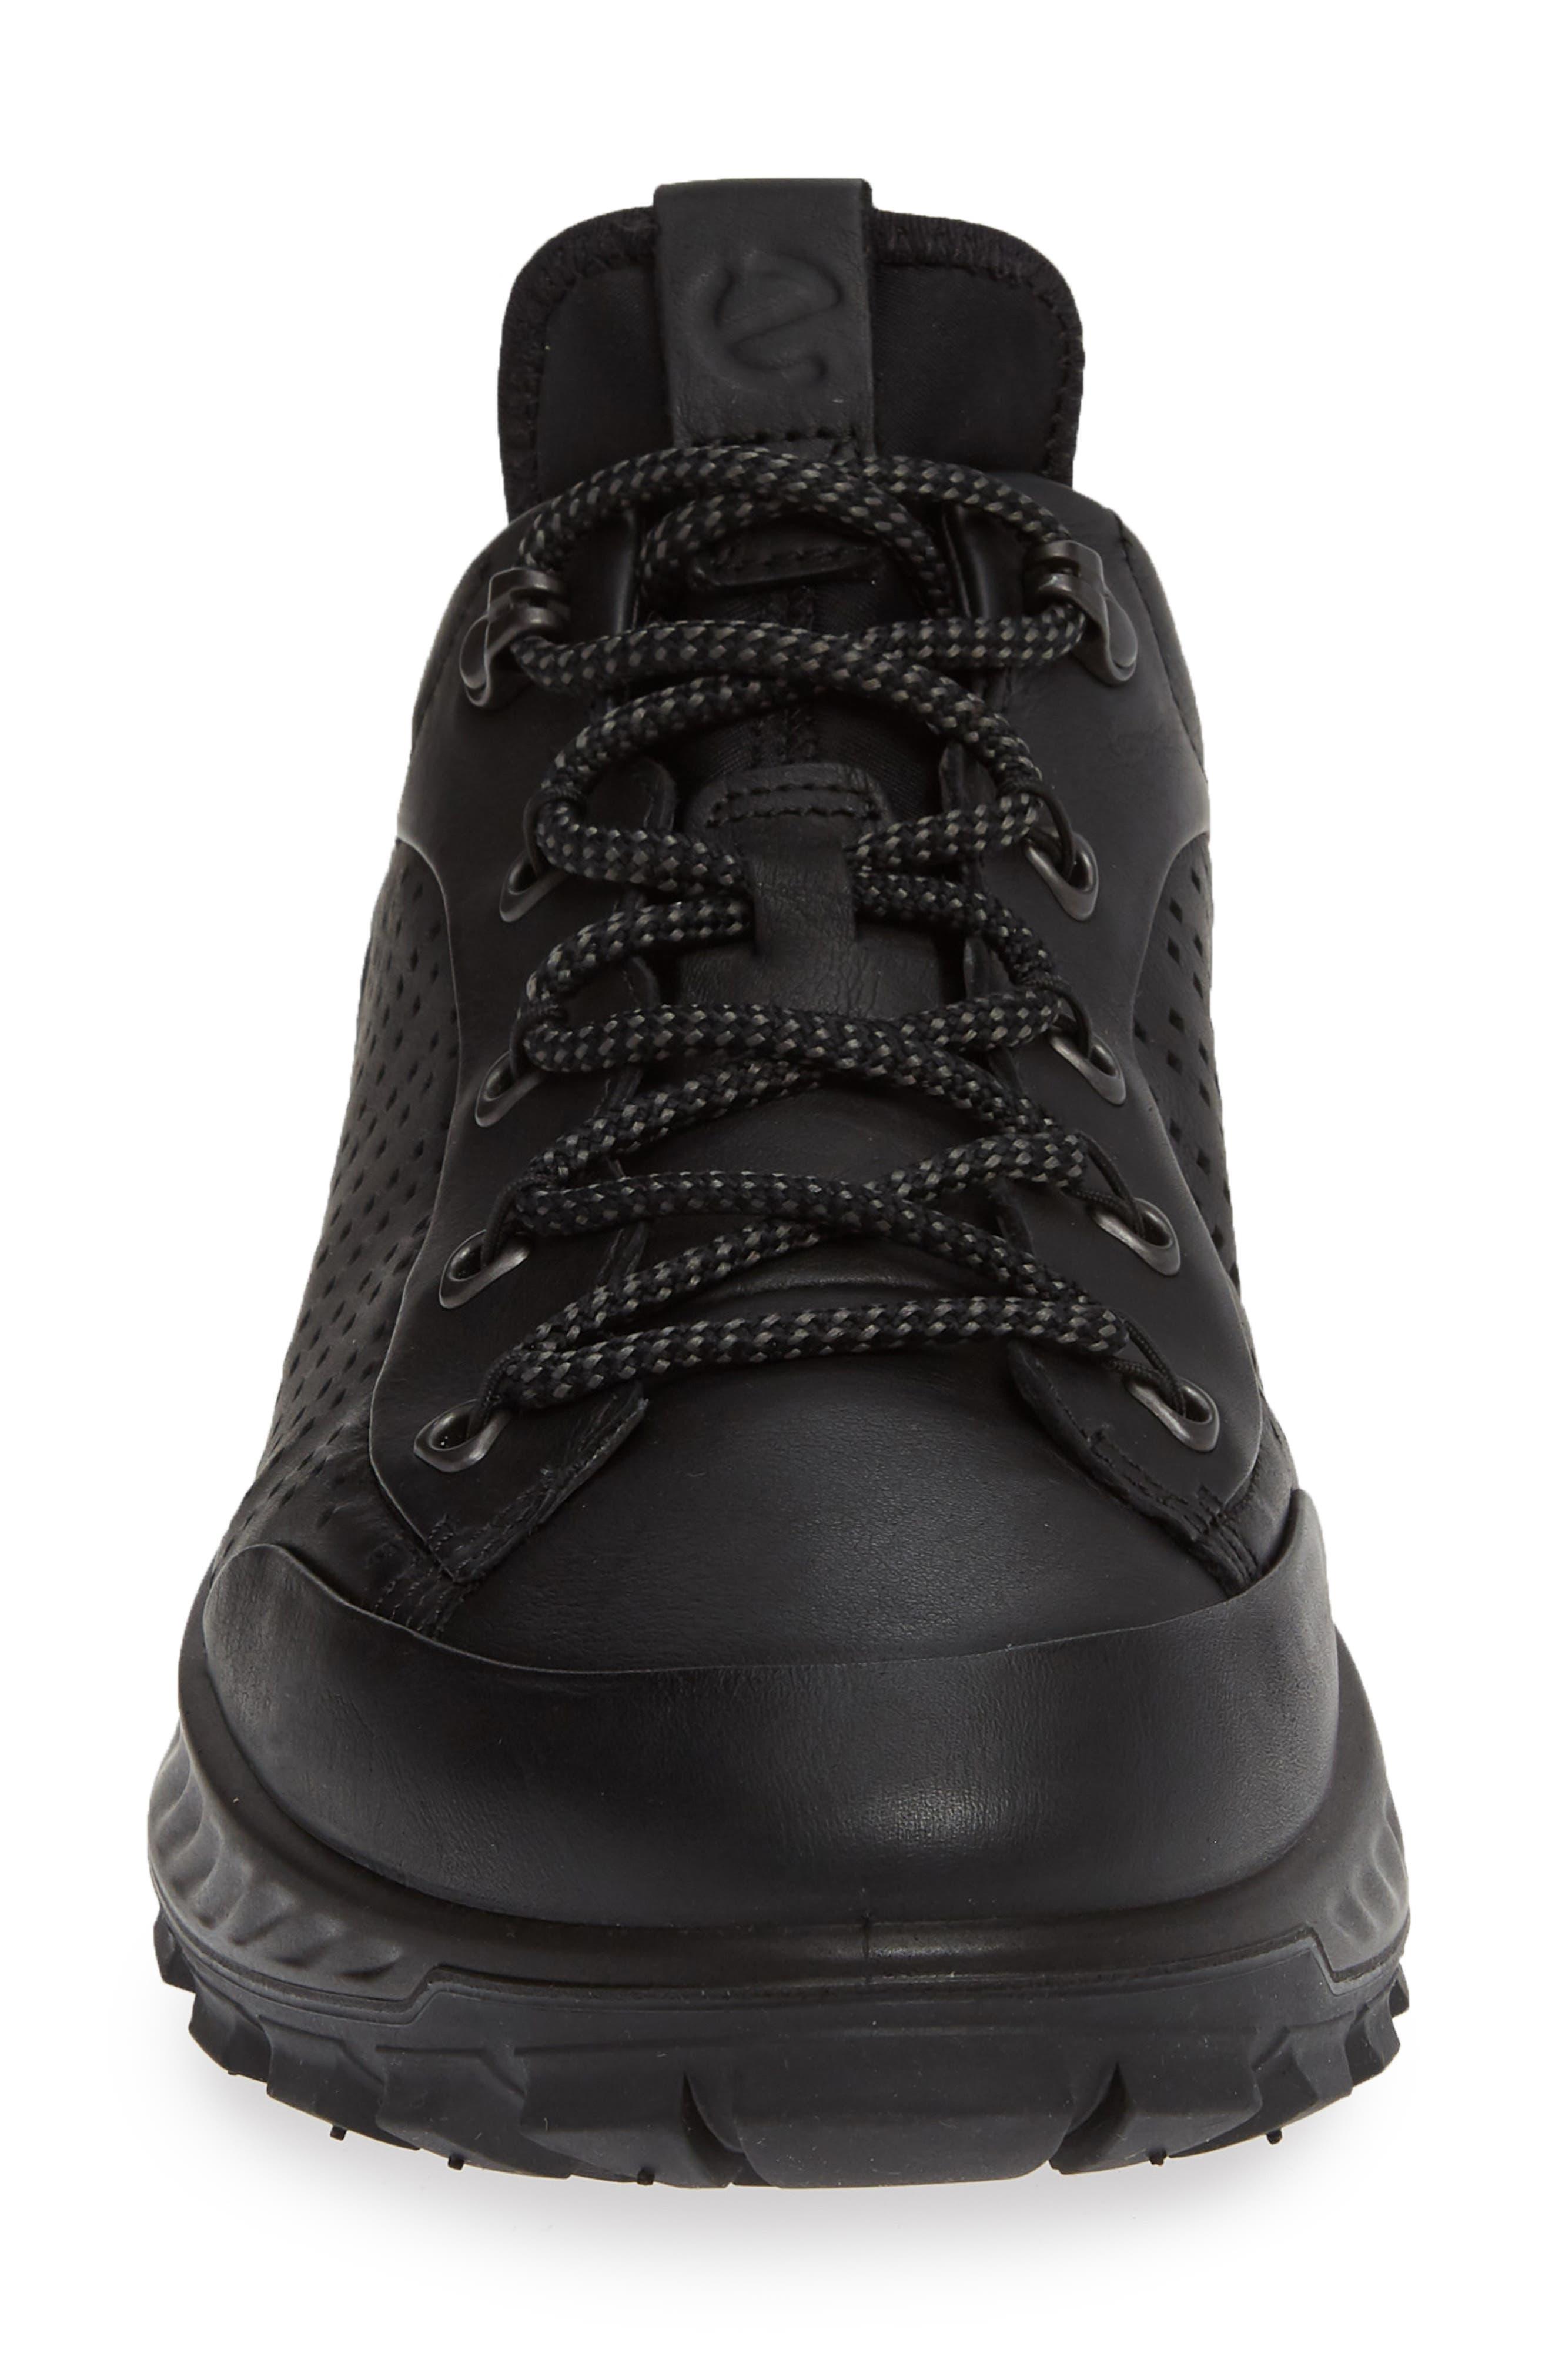 Exostrike High Top Sneaker,                             Alternate thumbnail 4, color,                             BLACK LEATHER